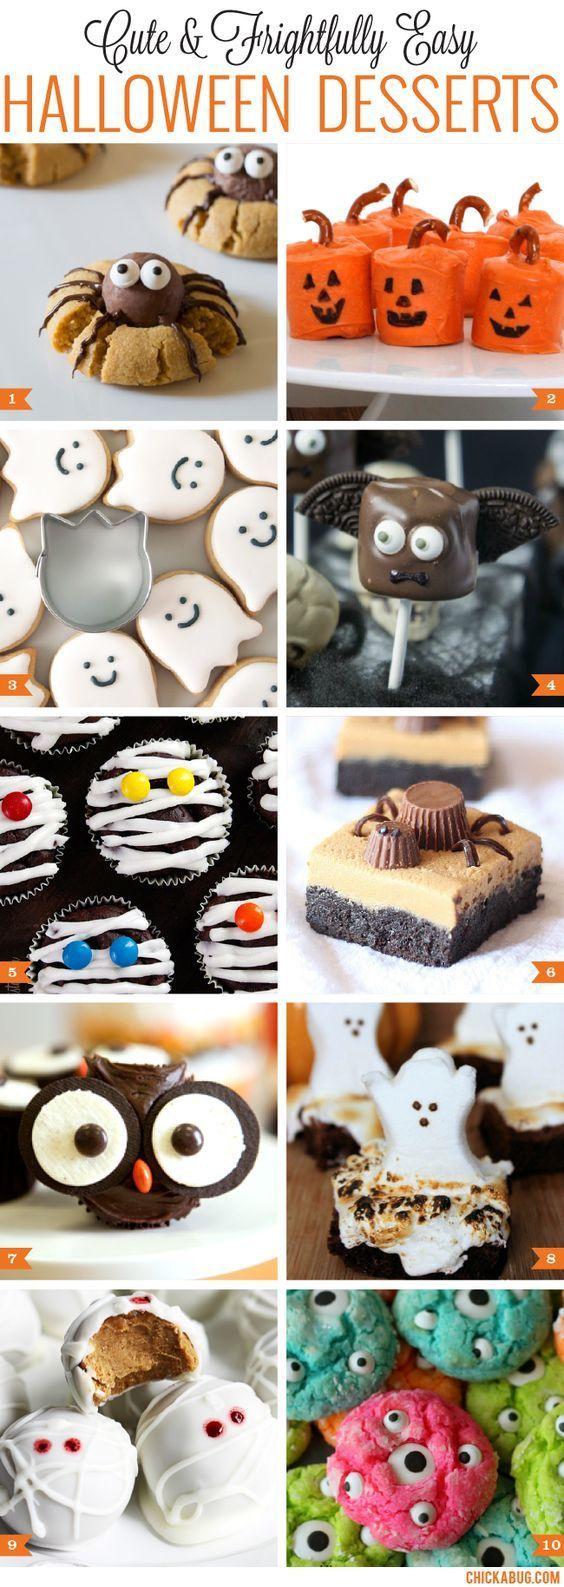 cuisine d'halloween - #Cuisine #dHalloween #halloweendesserts